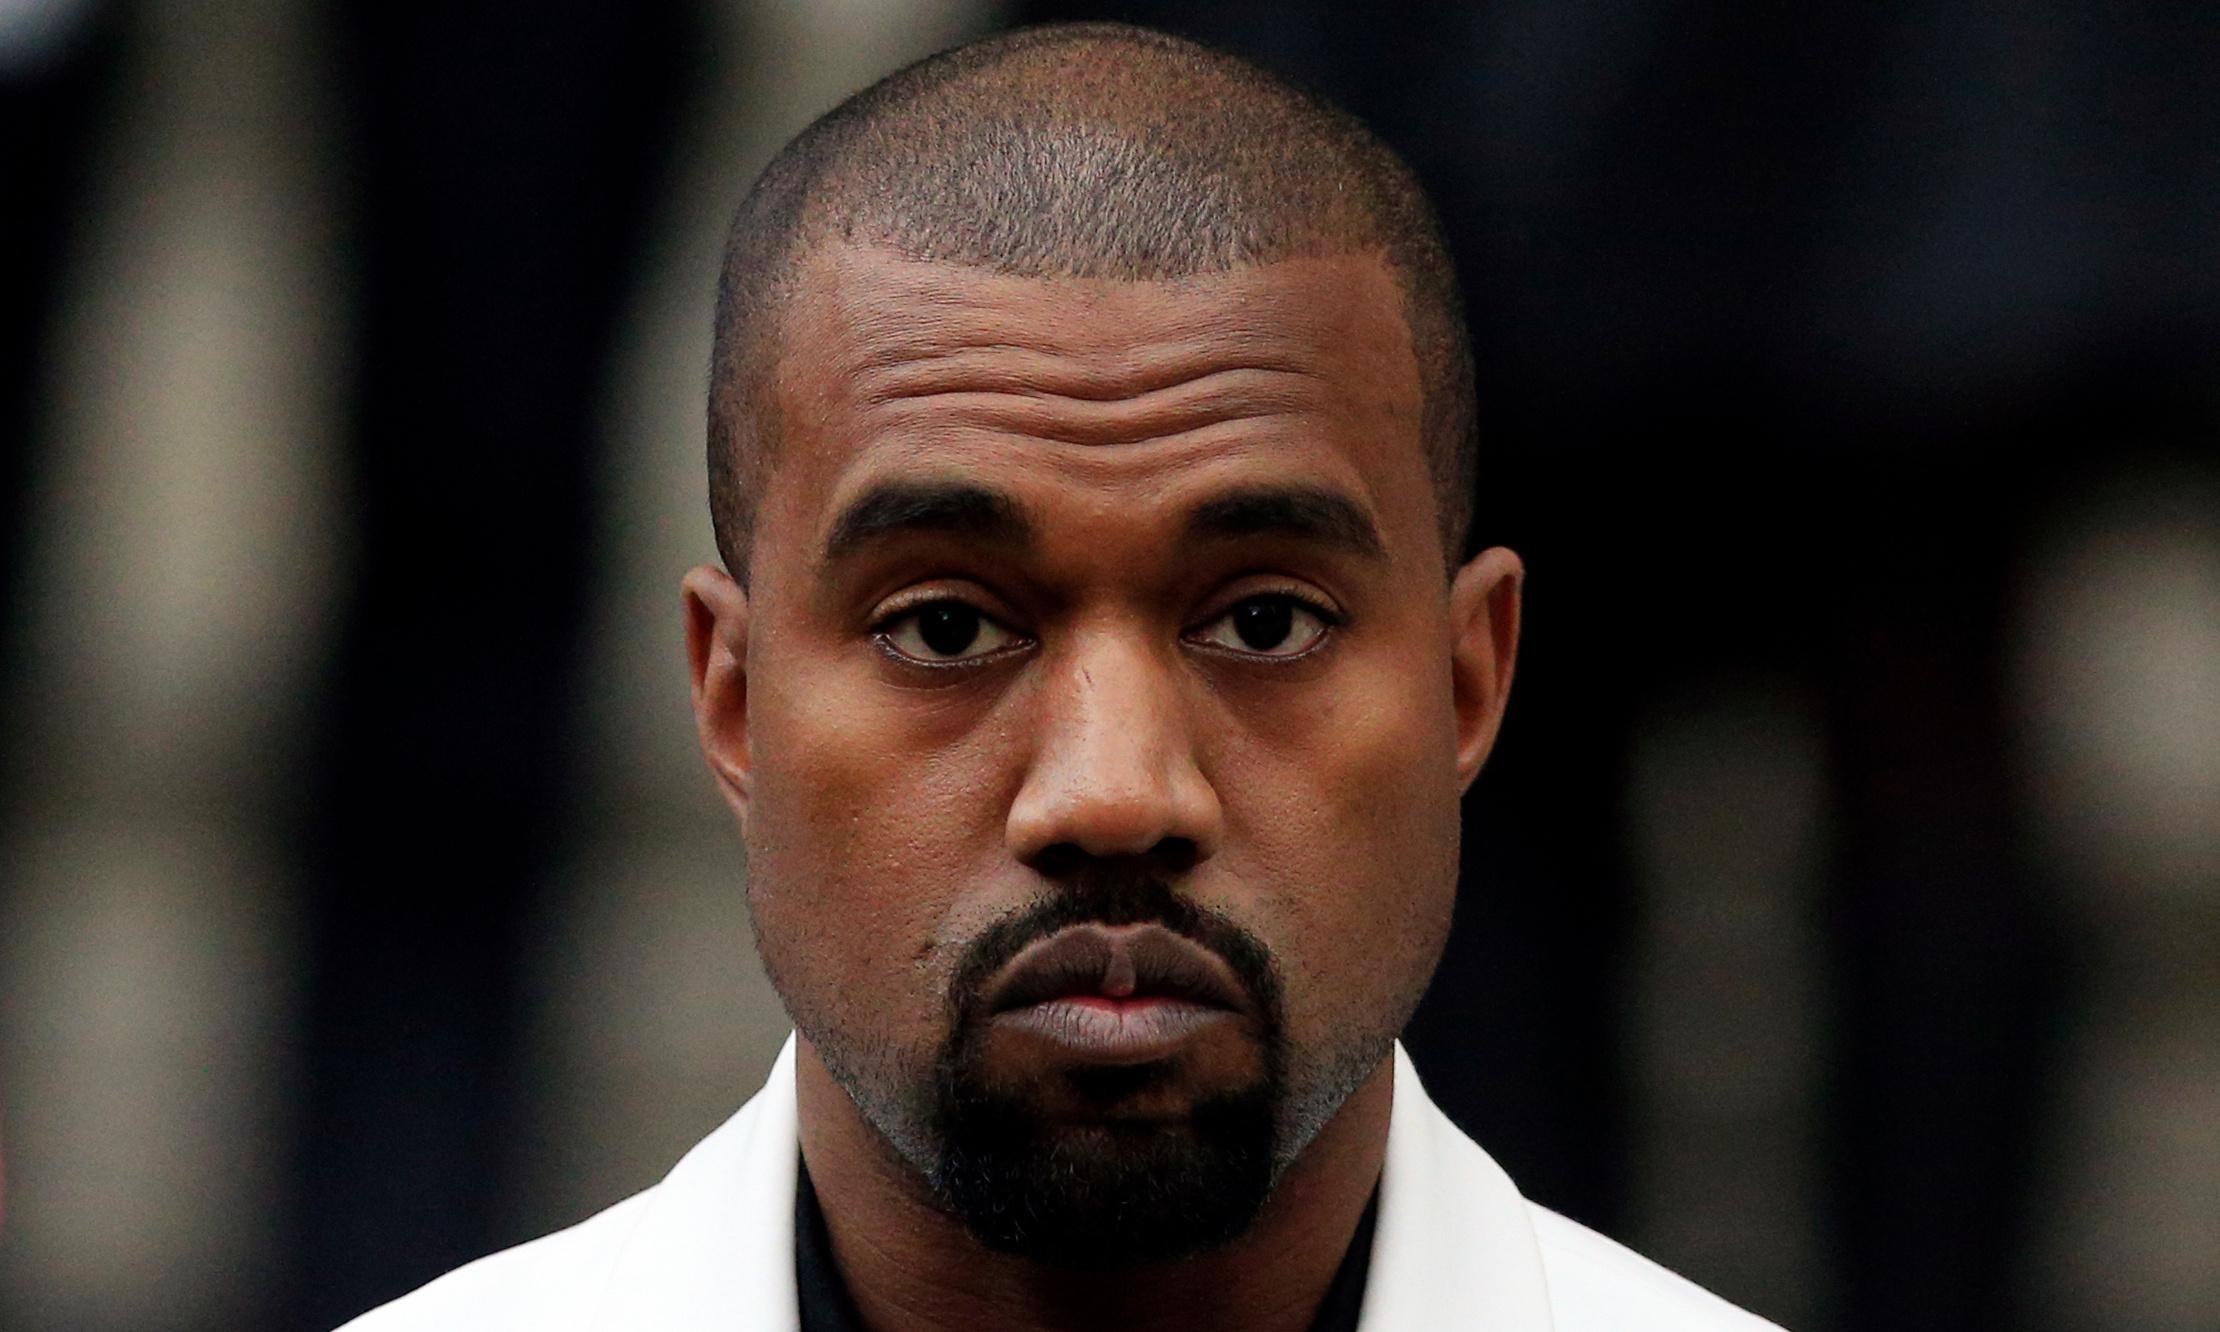 Hear Ye: Kanye West announces name change ahead of SNL